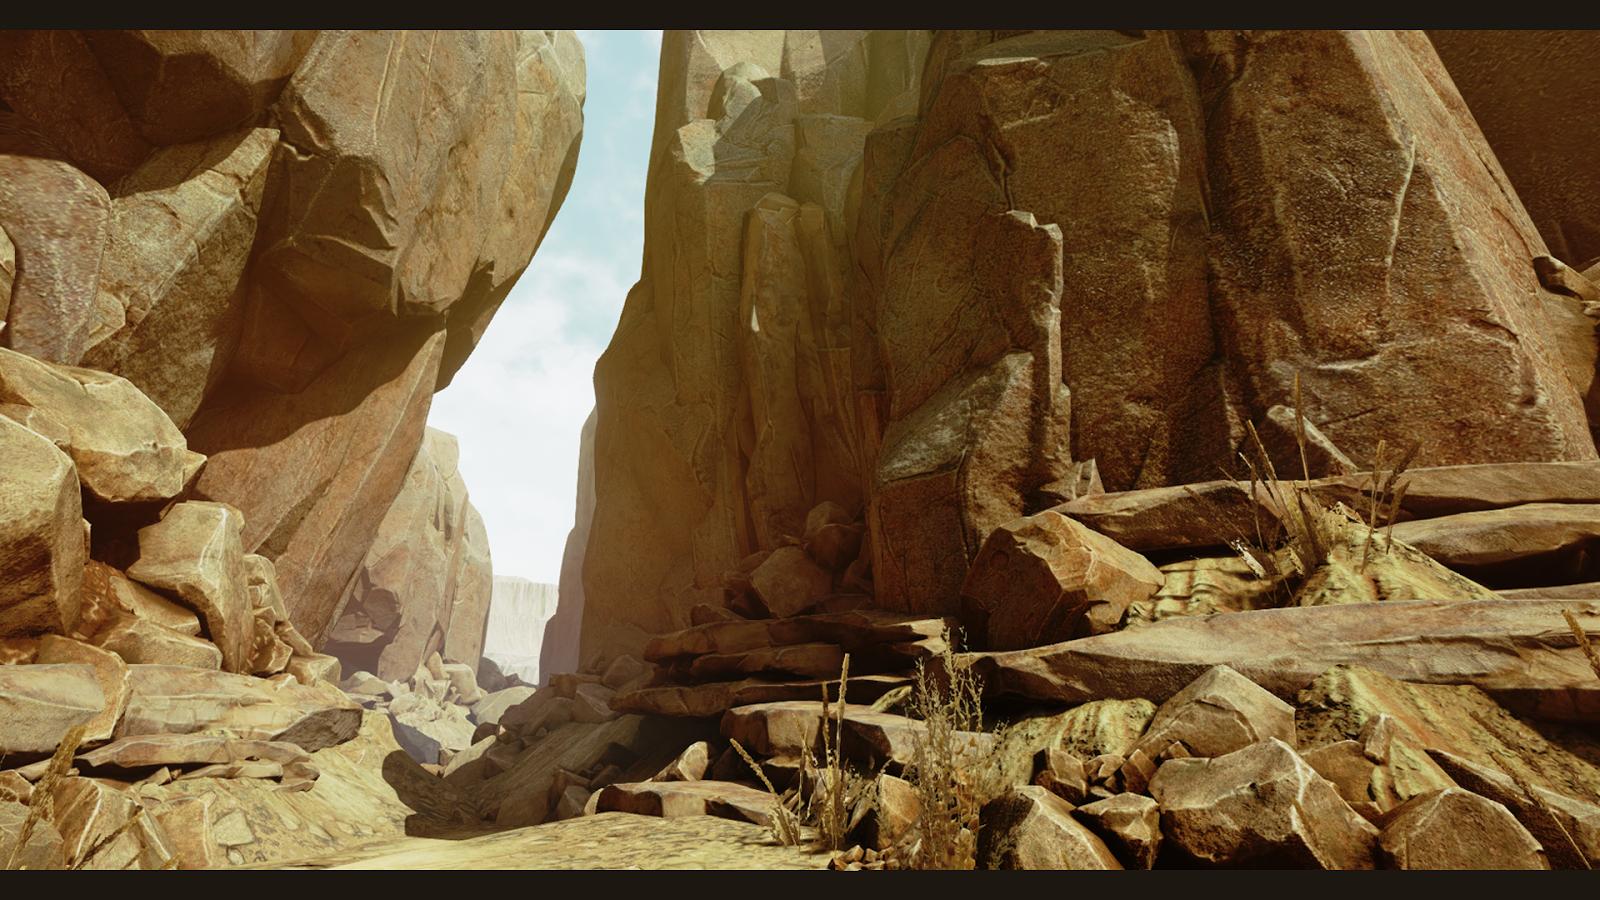 Jordan Logo 3d Wallpaper Art Of Tris Baybayan Arid Desert Environment Set